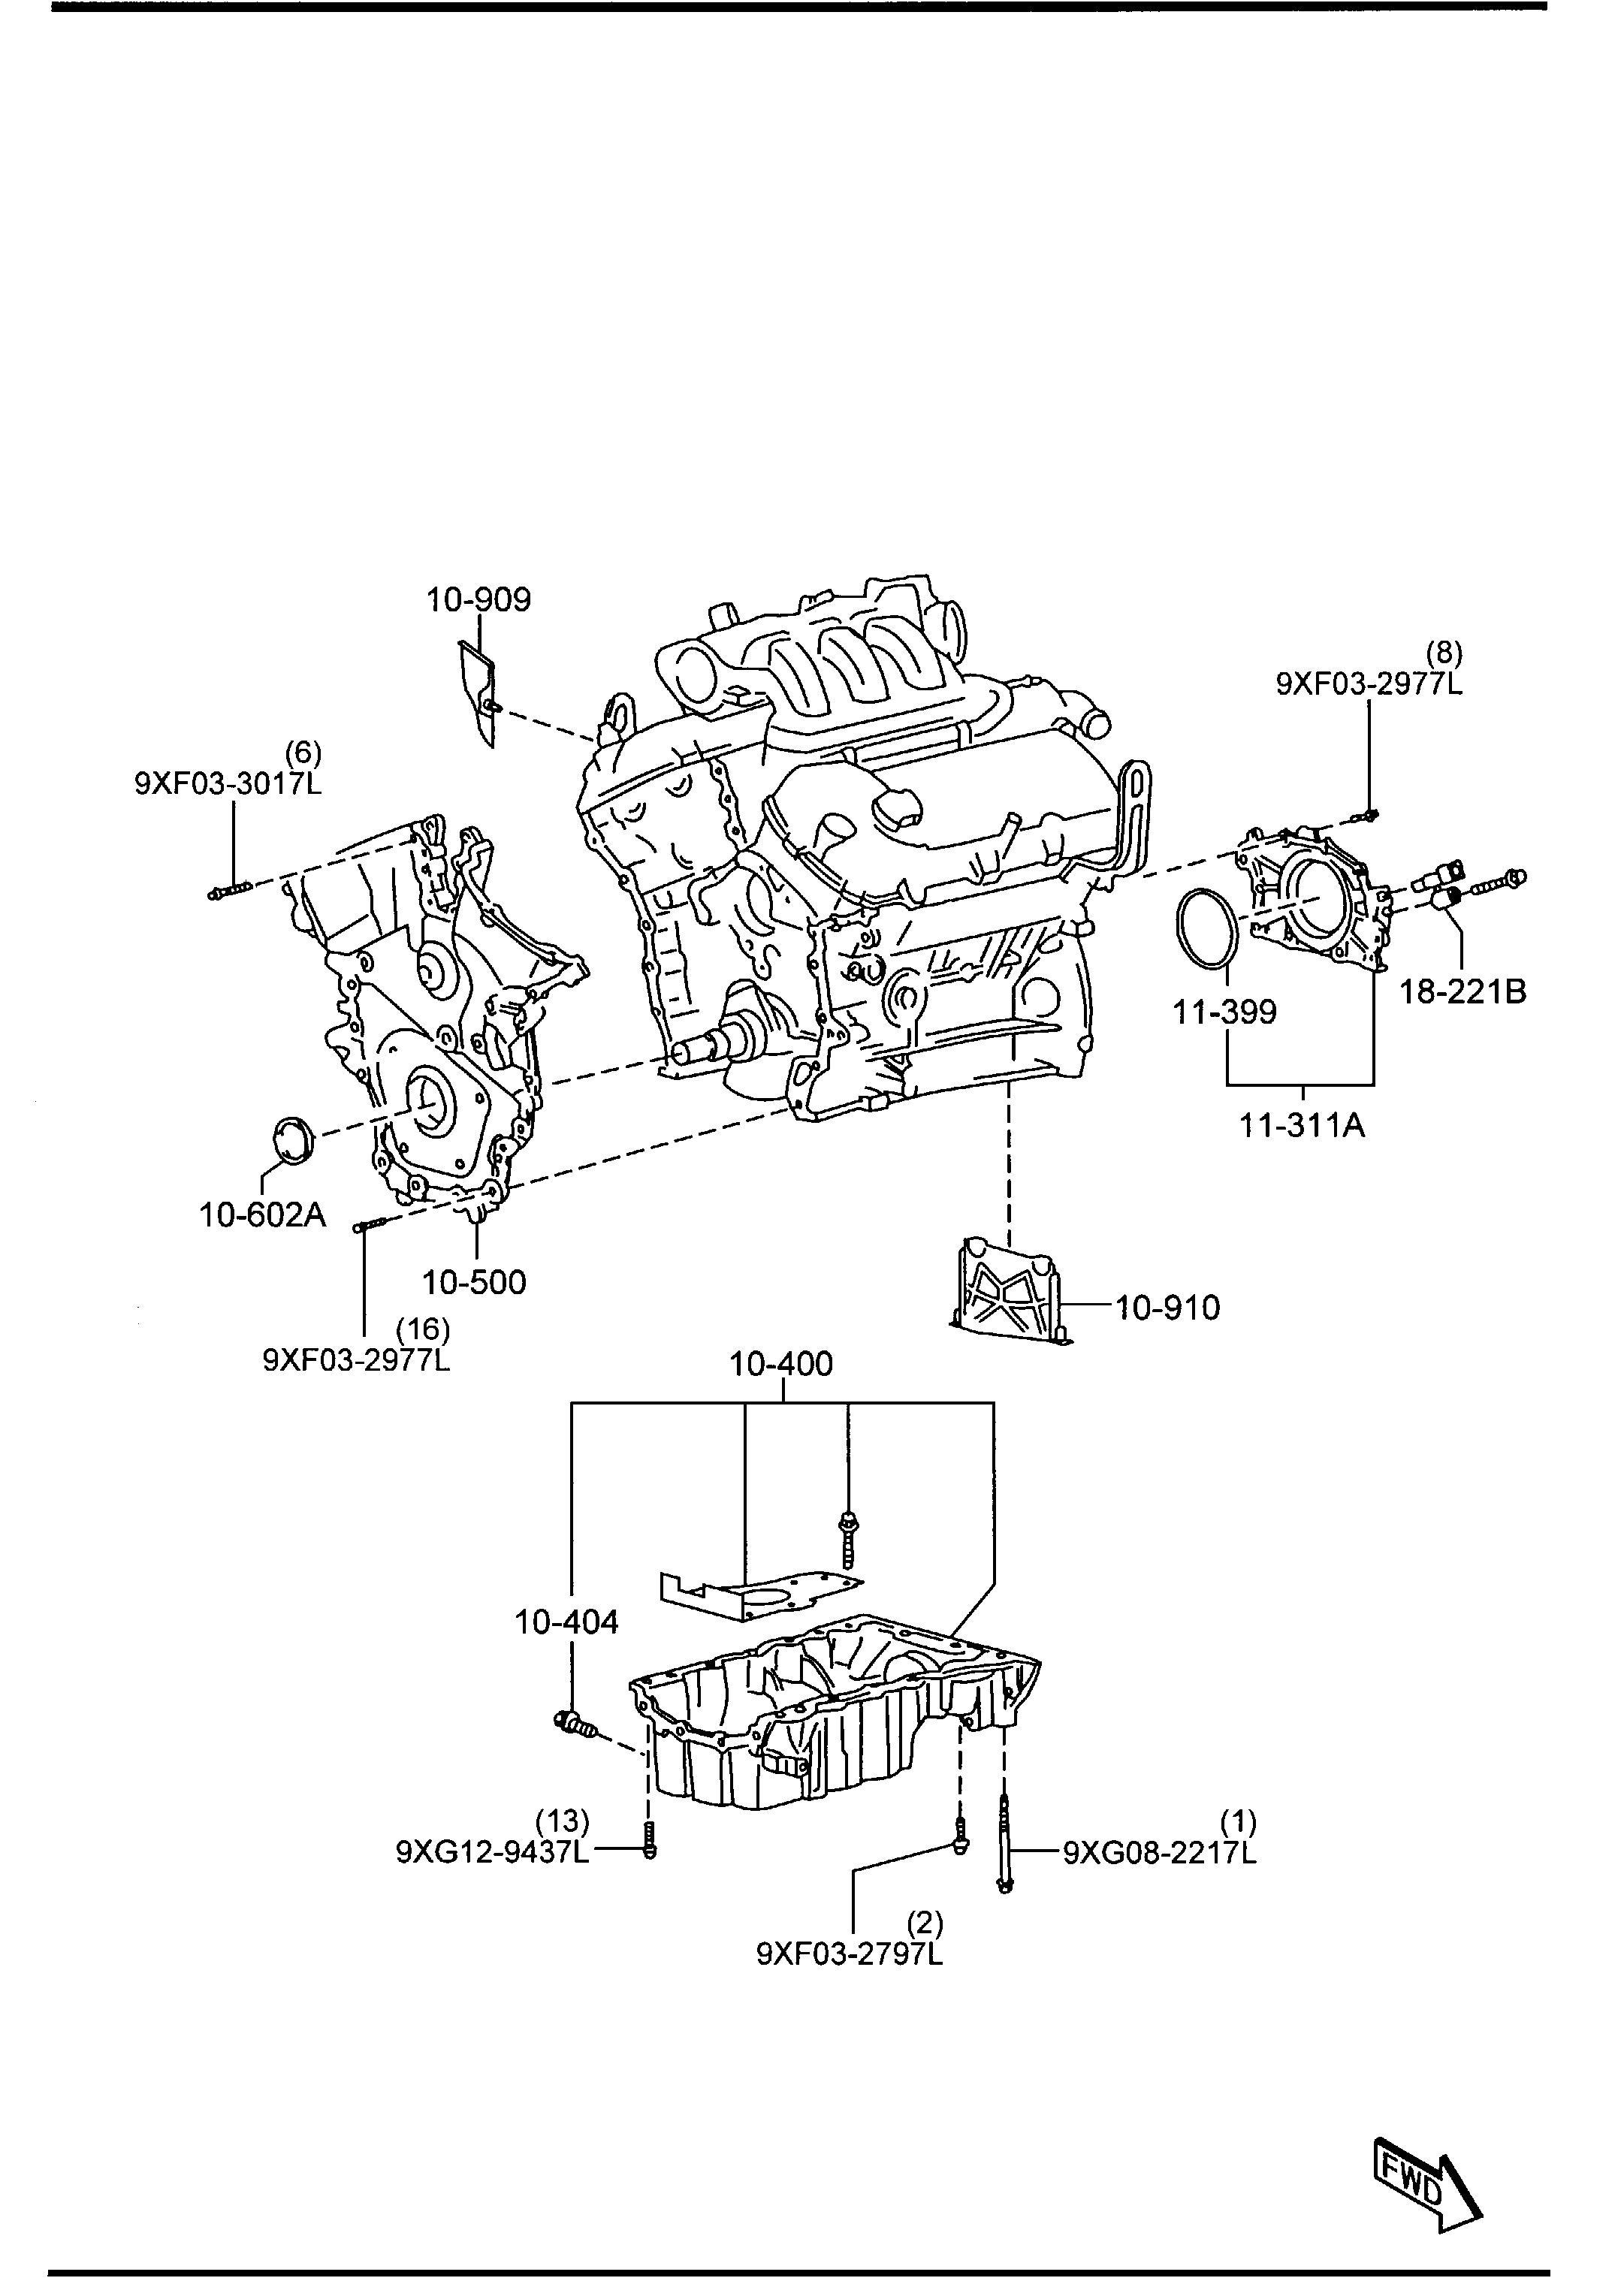 Mazda Cx 9 Engine Crankshaft Seal 3 7 Liter Cx 9